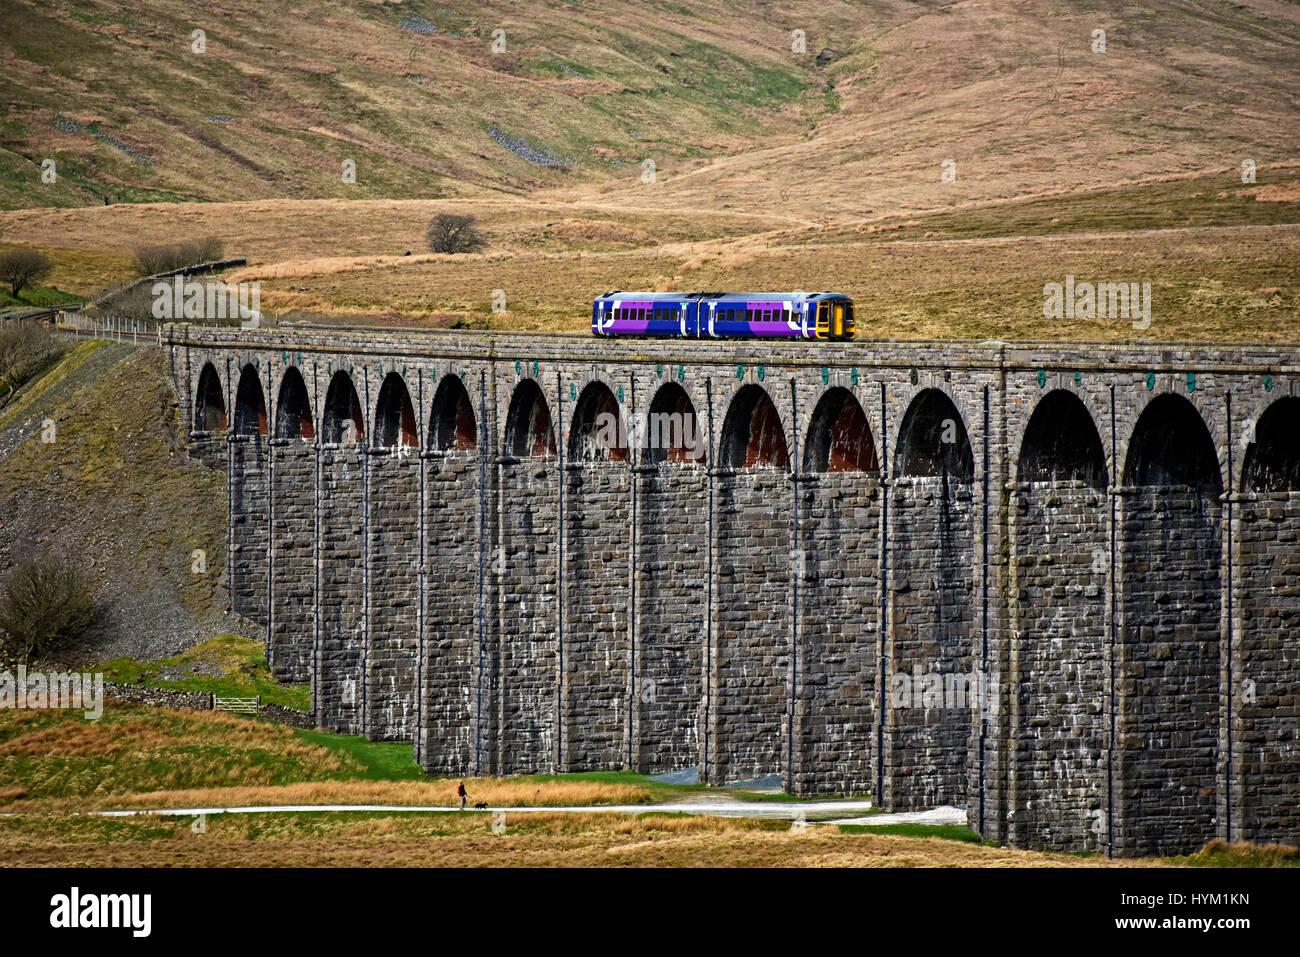 passenger-train-crossing-the-ribblehead-viaduct-on-the-settle-to-carlisle-HYM1KN.jpg